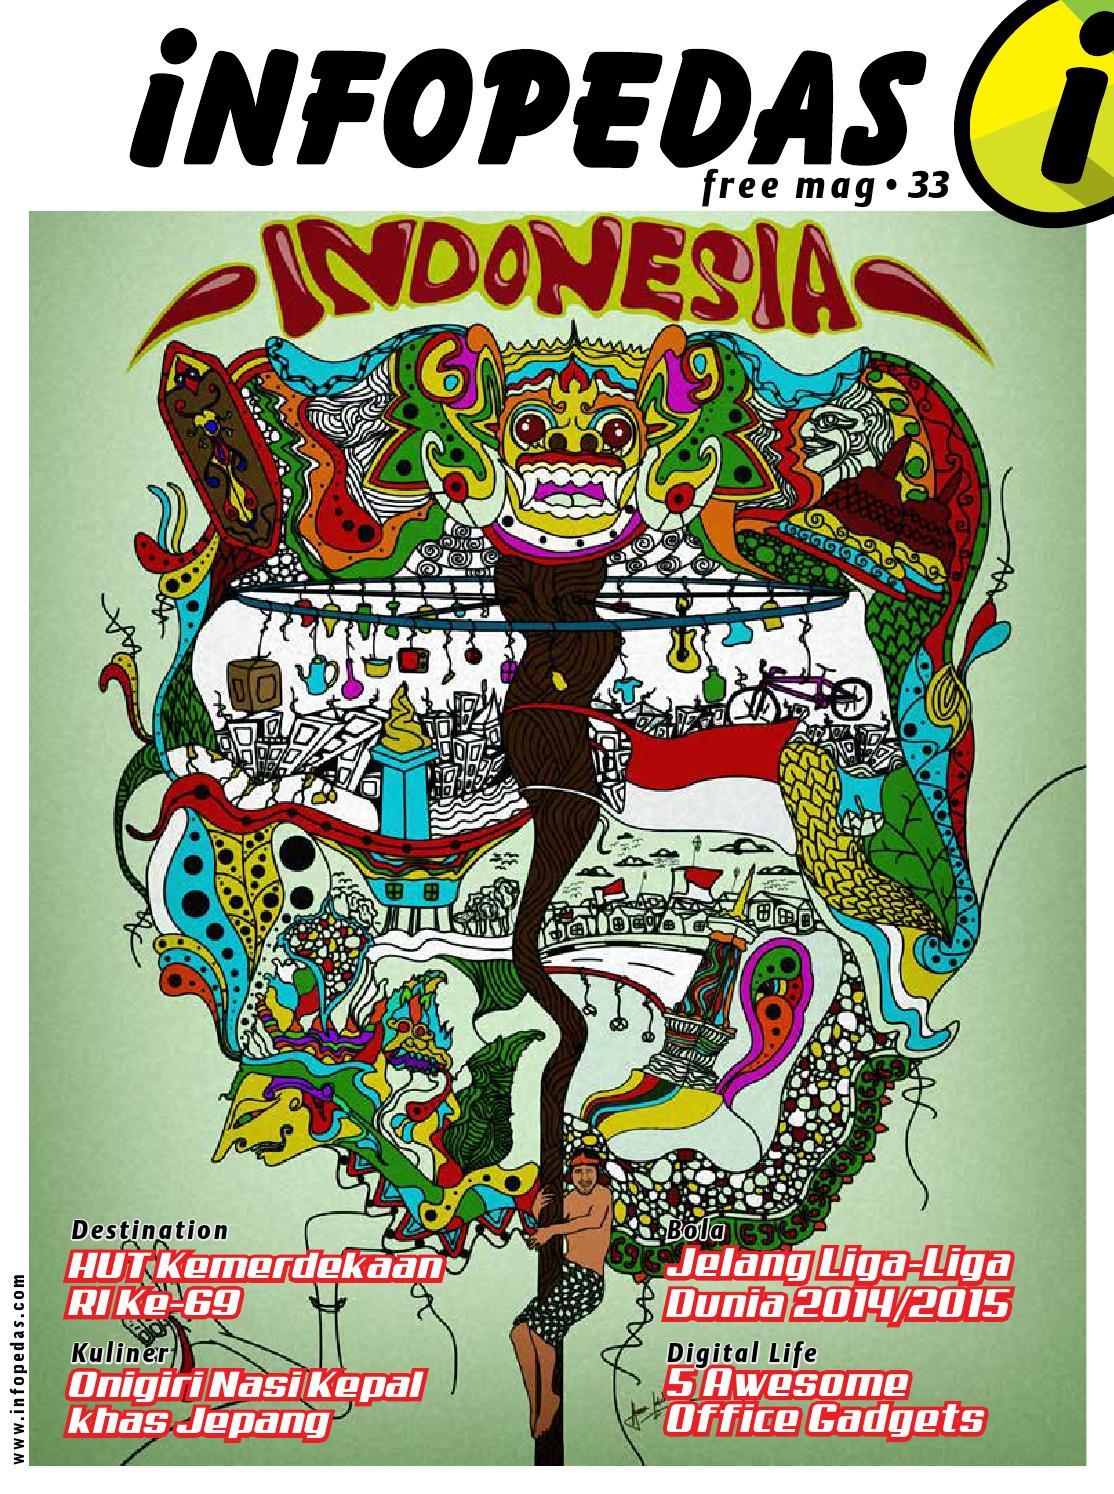 Majalah iNFOPEDAS edisi 33 by PEDAS - issuu de85fda4db